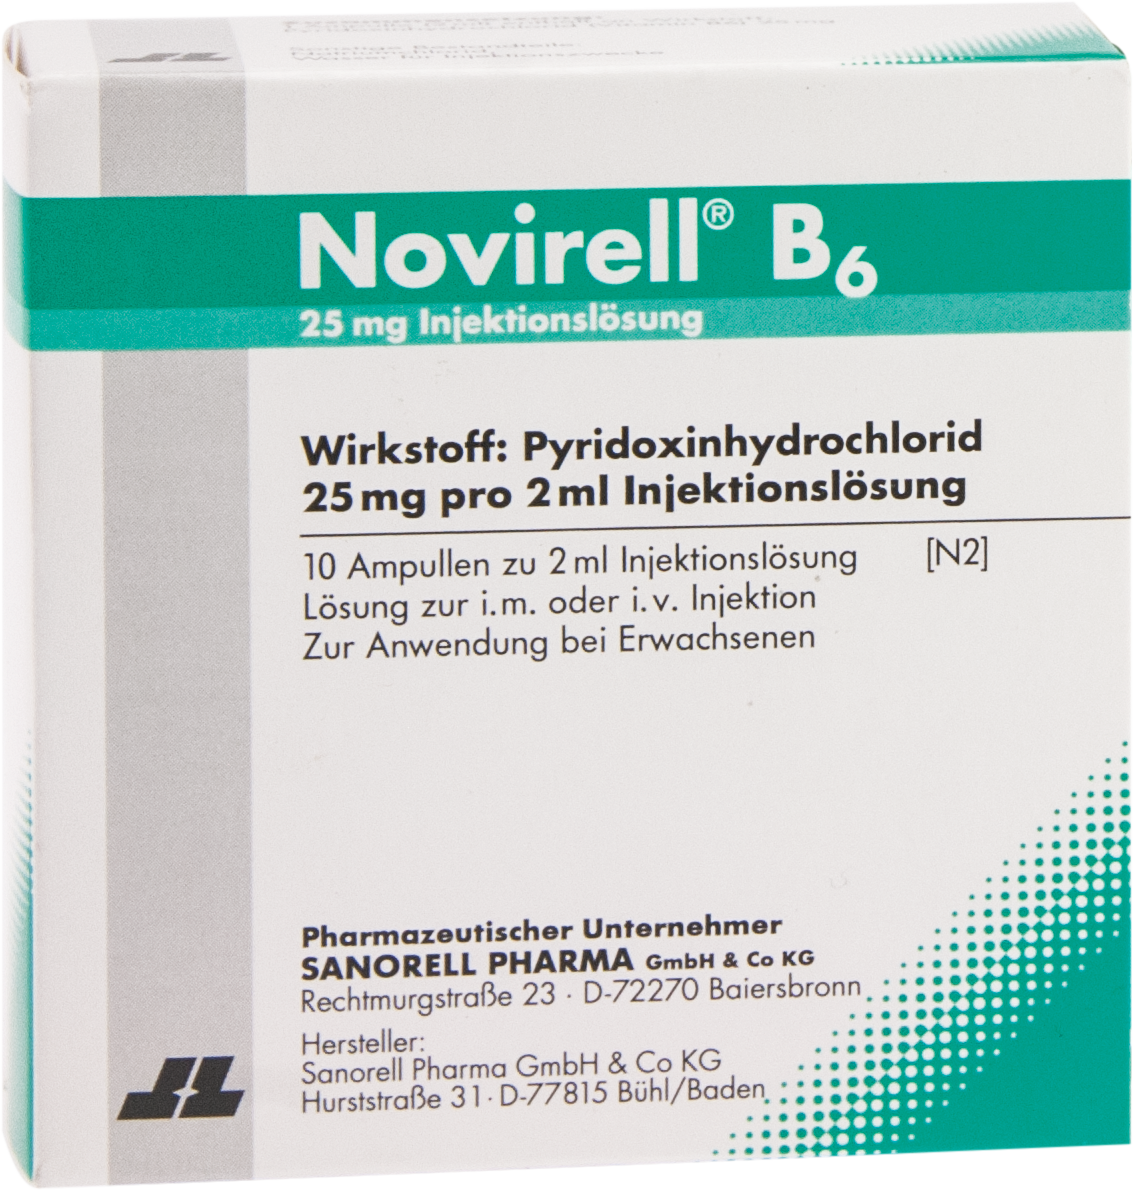 Novirell B6 25mg Injektionslösung